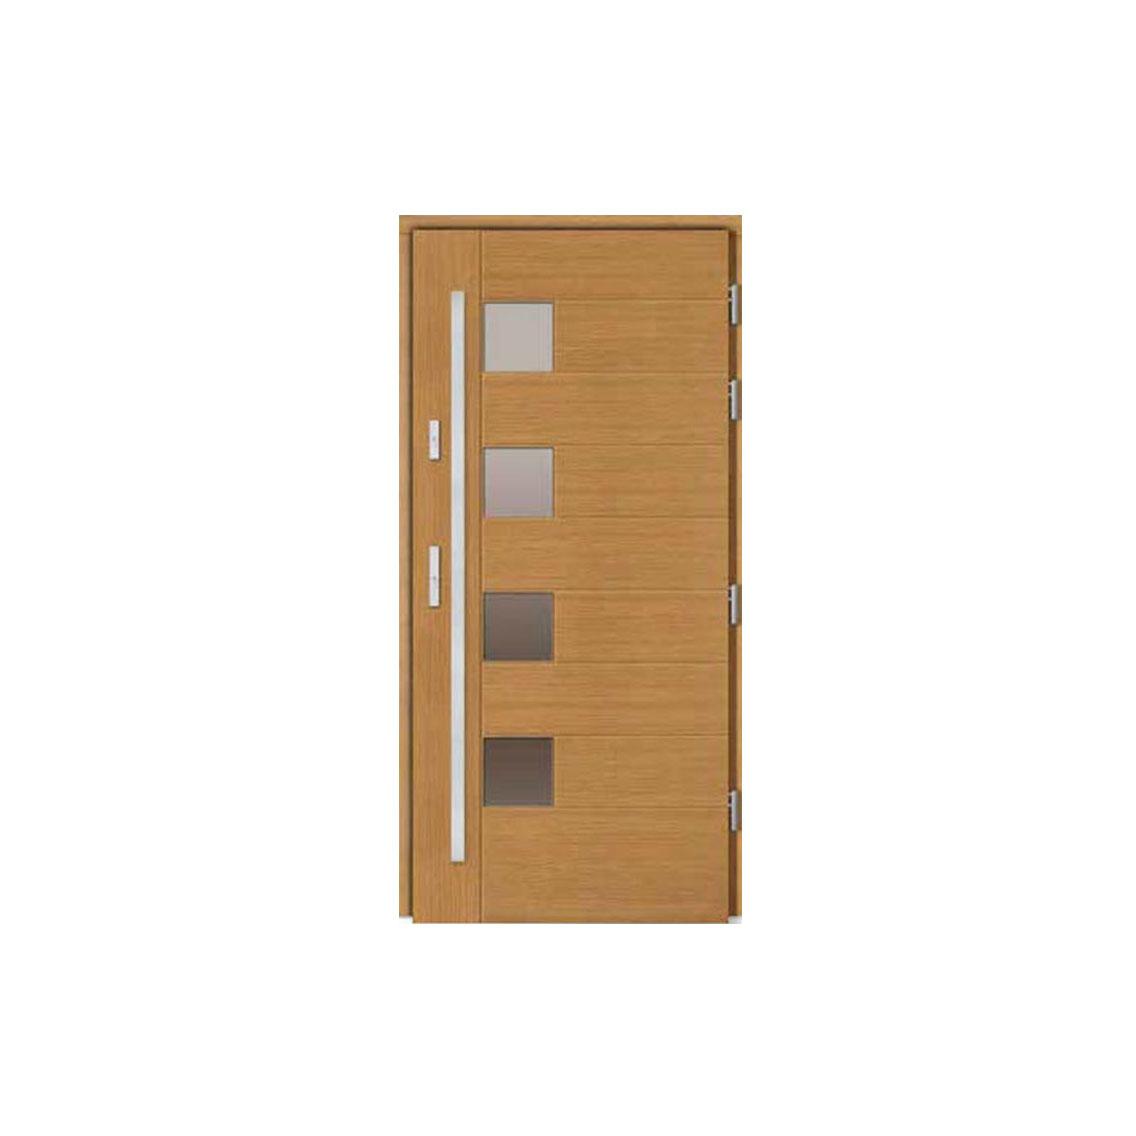 Koka durvis WD-9